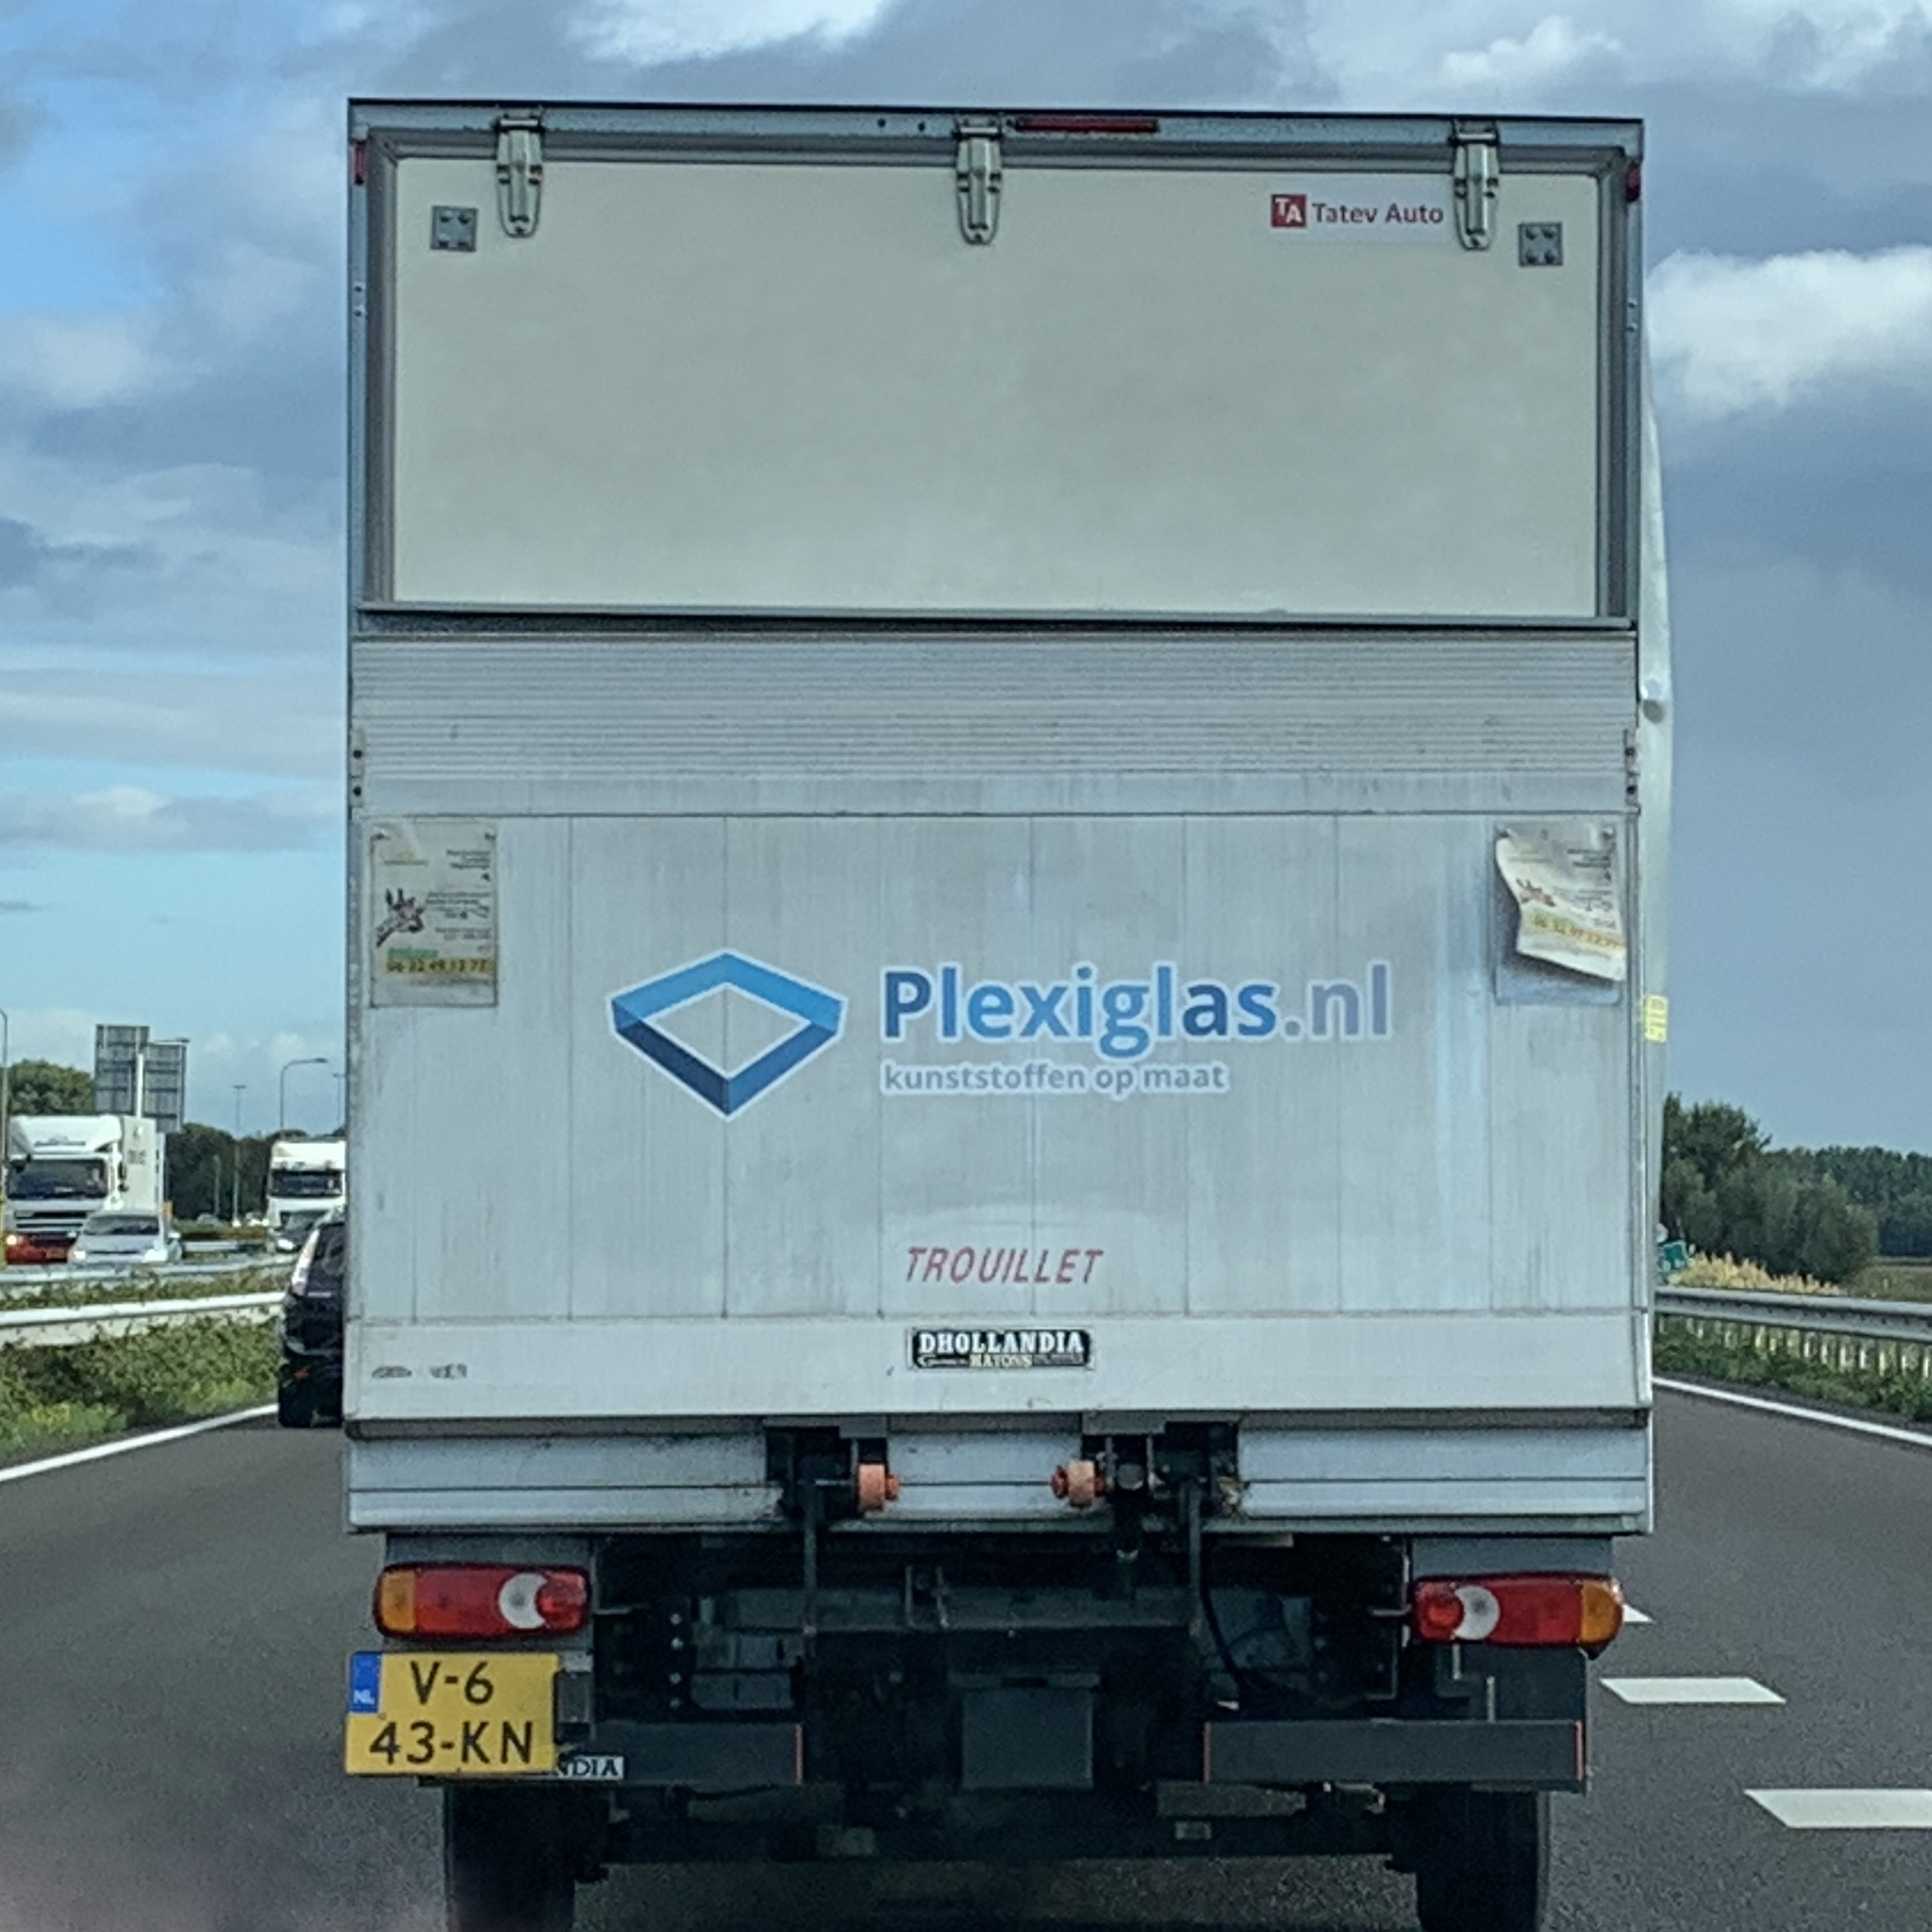 bezorging Plexiglas.nl